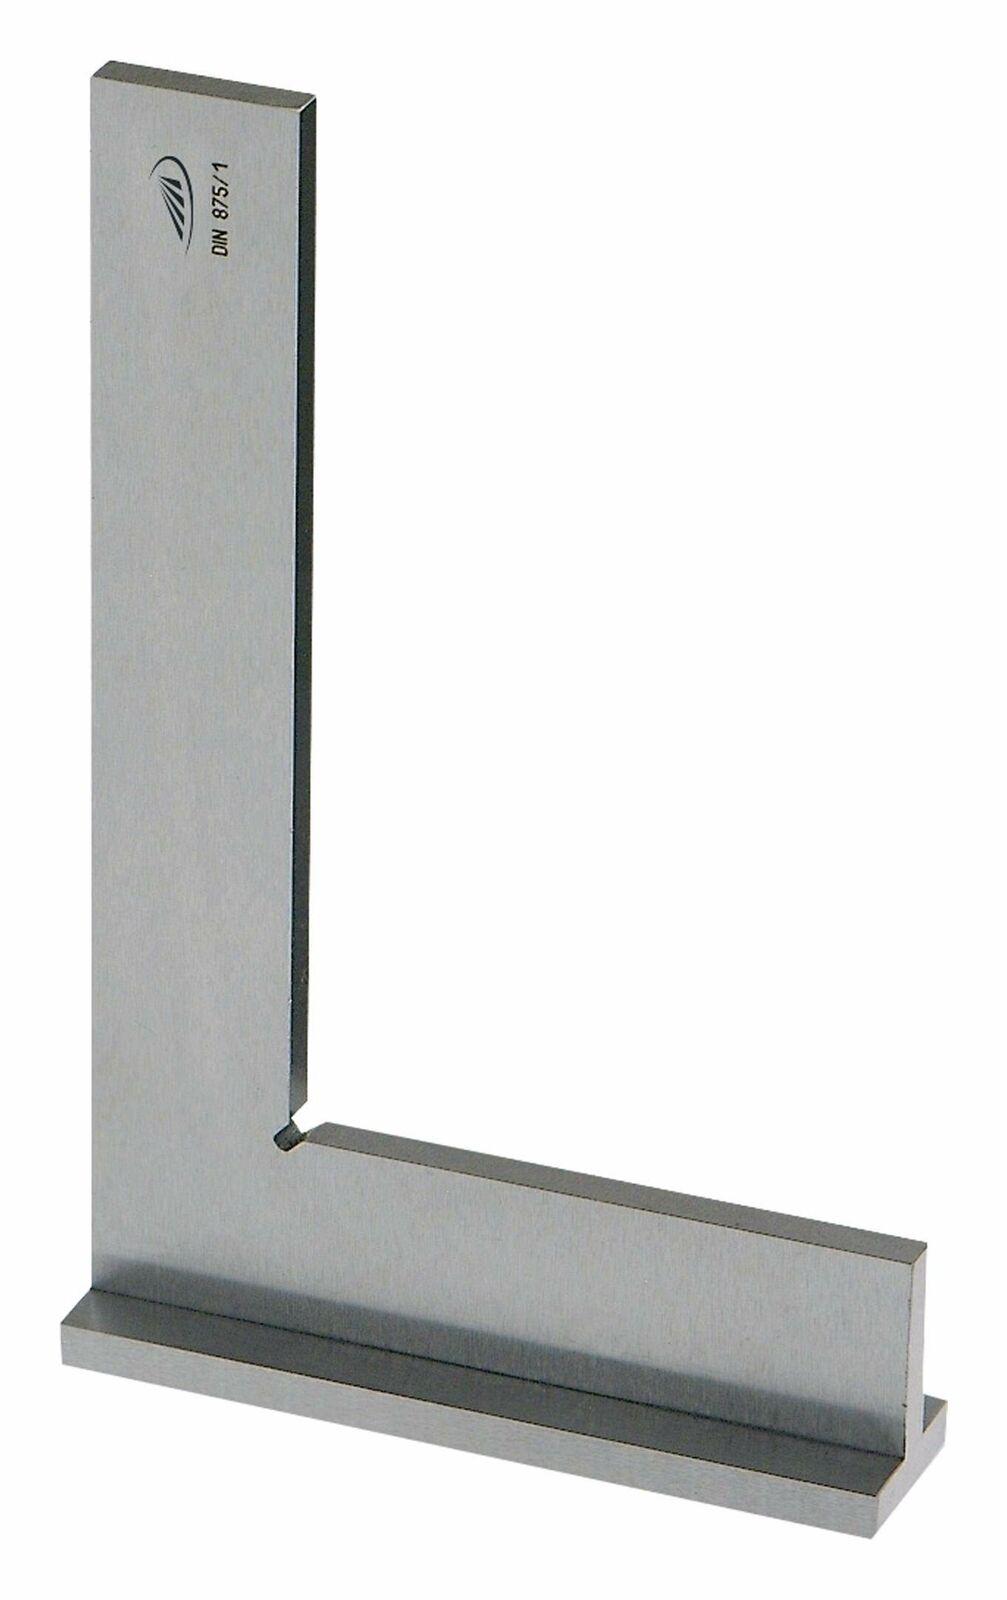 Helios Preisser Anschlagwinkel D875 0 B 150 x 100mm rostfei - 0368204